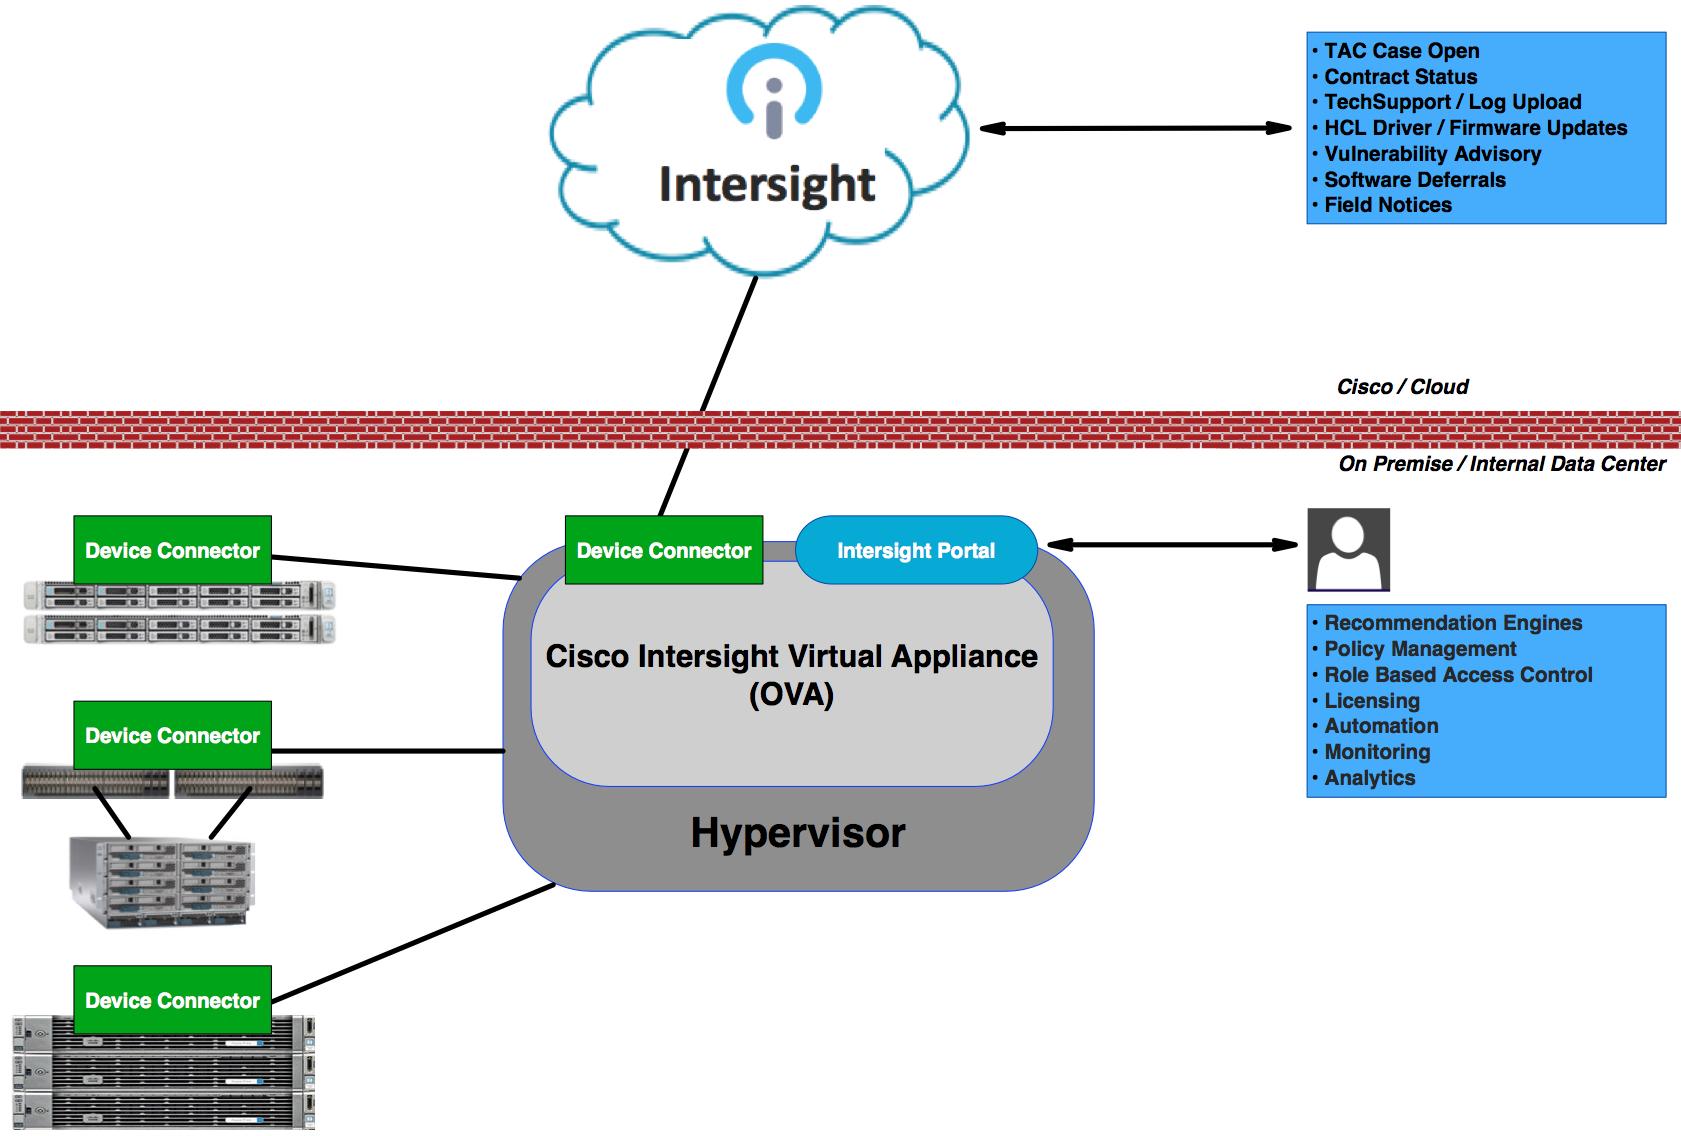 Intersight virtual appliance